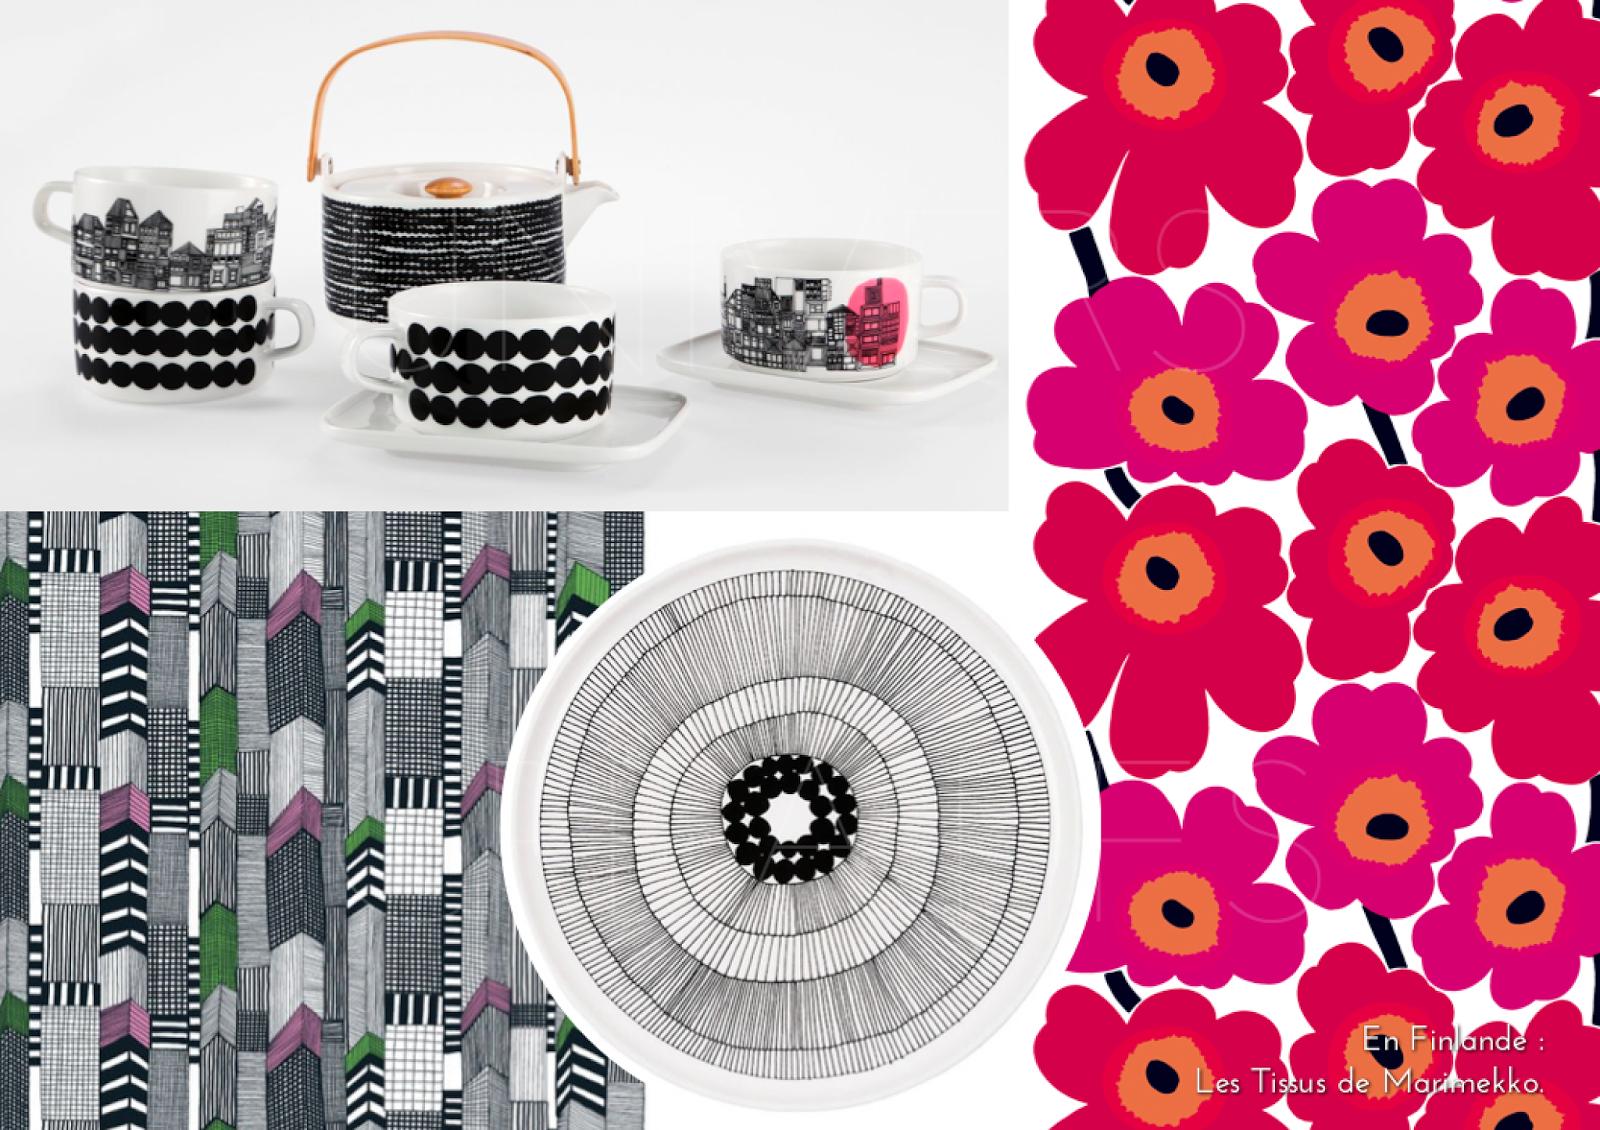 univers creatifs en finlande les tissus de marimekko. Black Bedroom Furniture Sets. Home Design Ideas